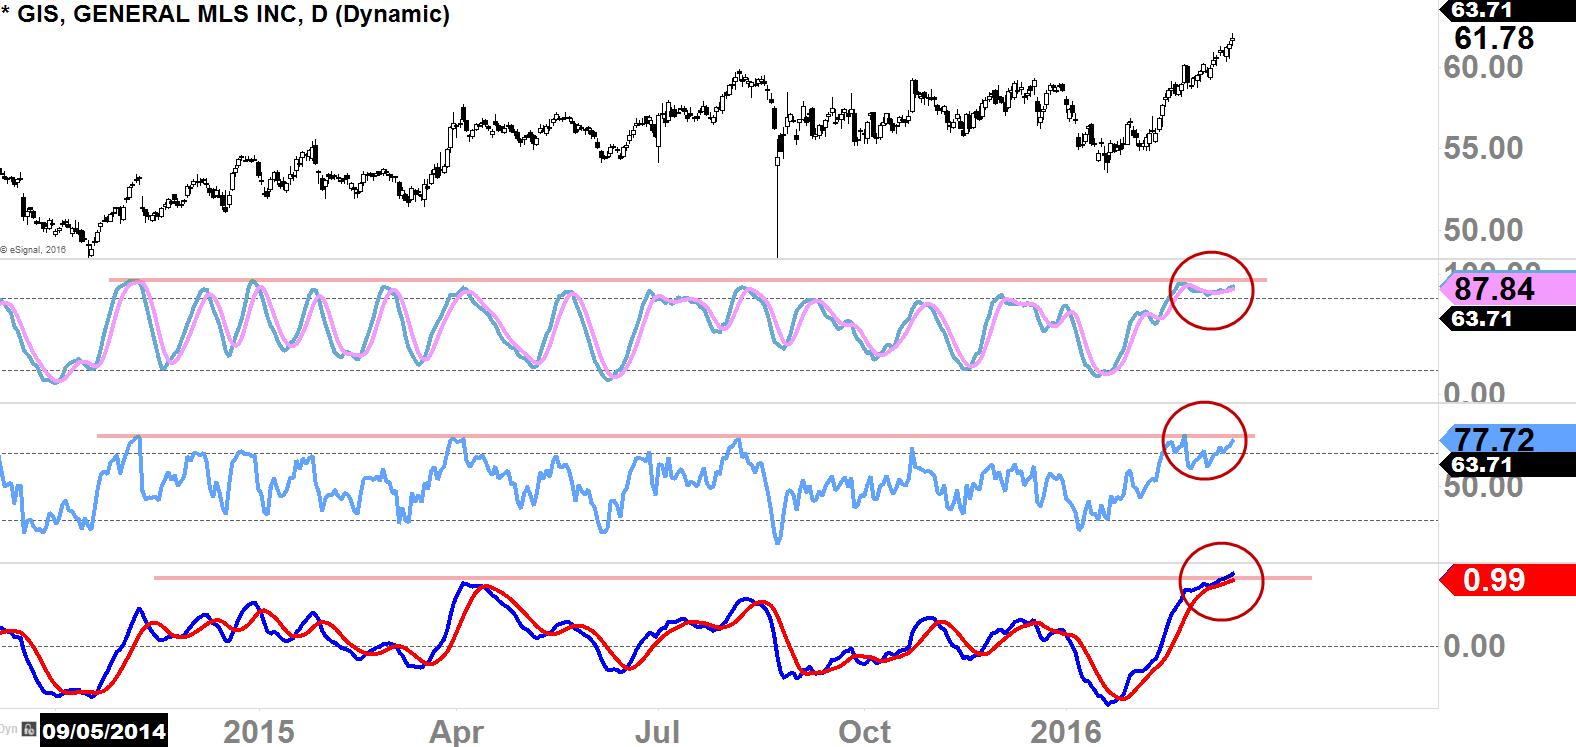 GIS Daily-Chart 2014 - 2016